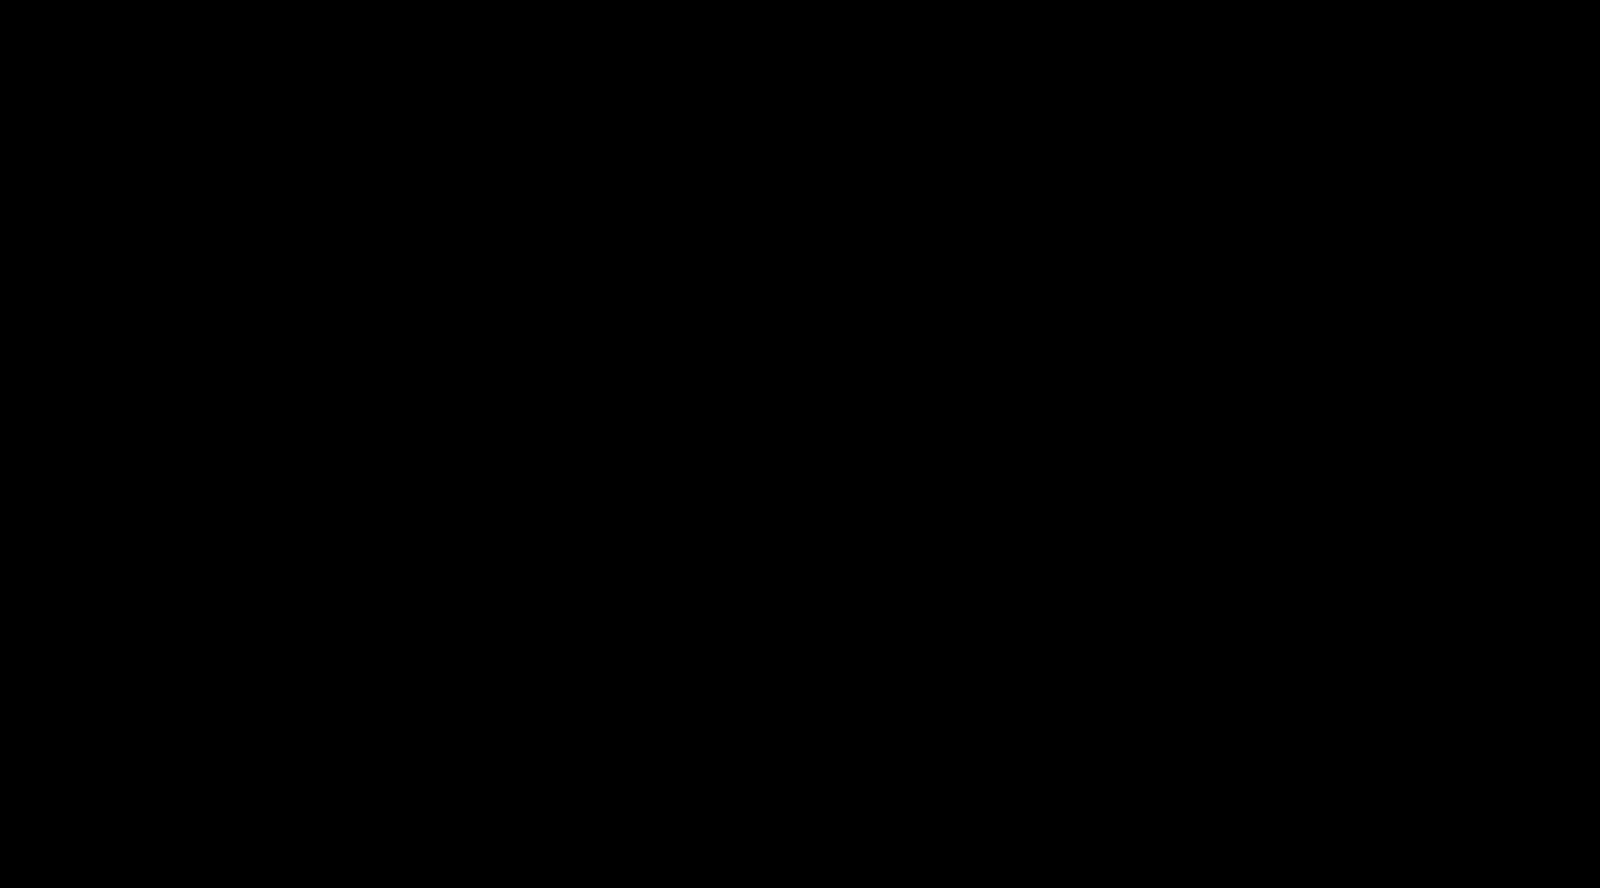 Kakashi Lineart : Naruto kakashi lineart by romigd on deviantart